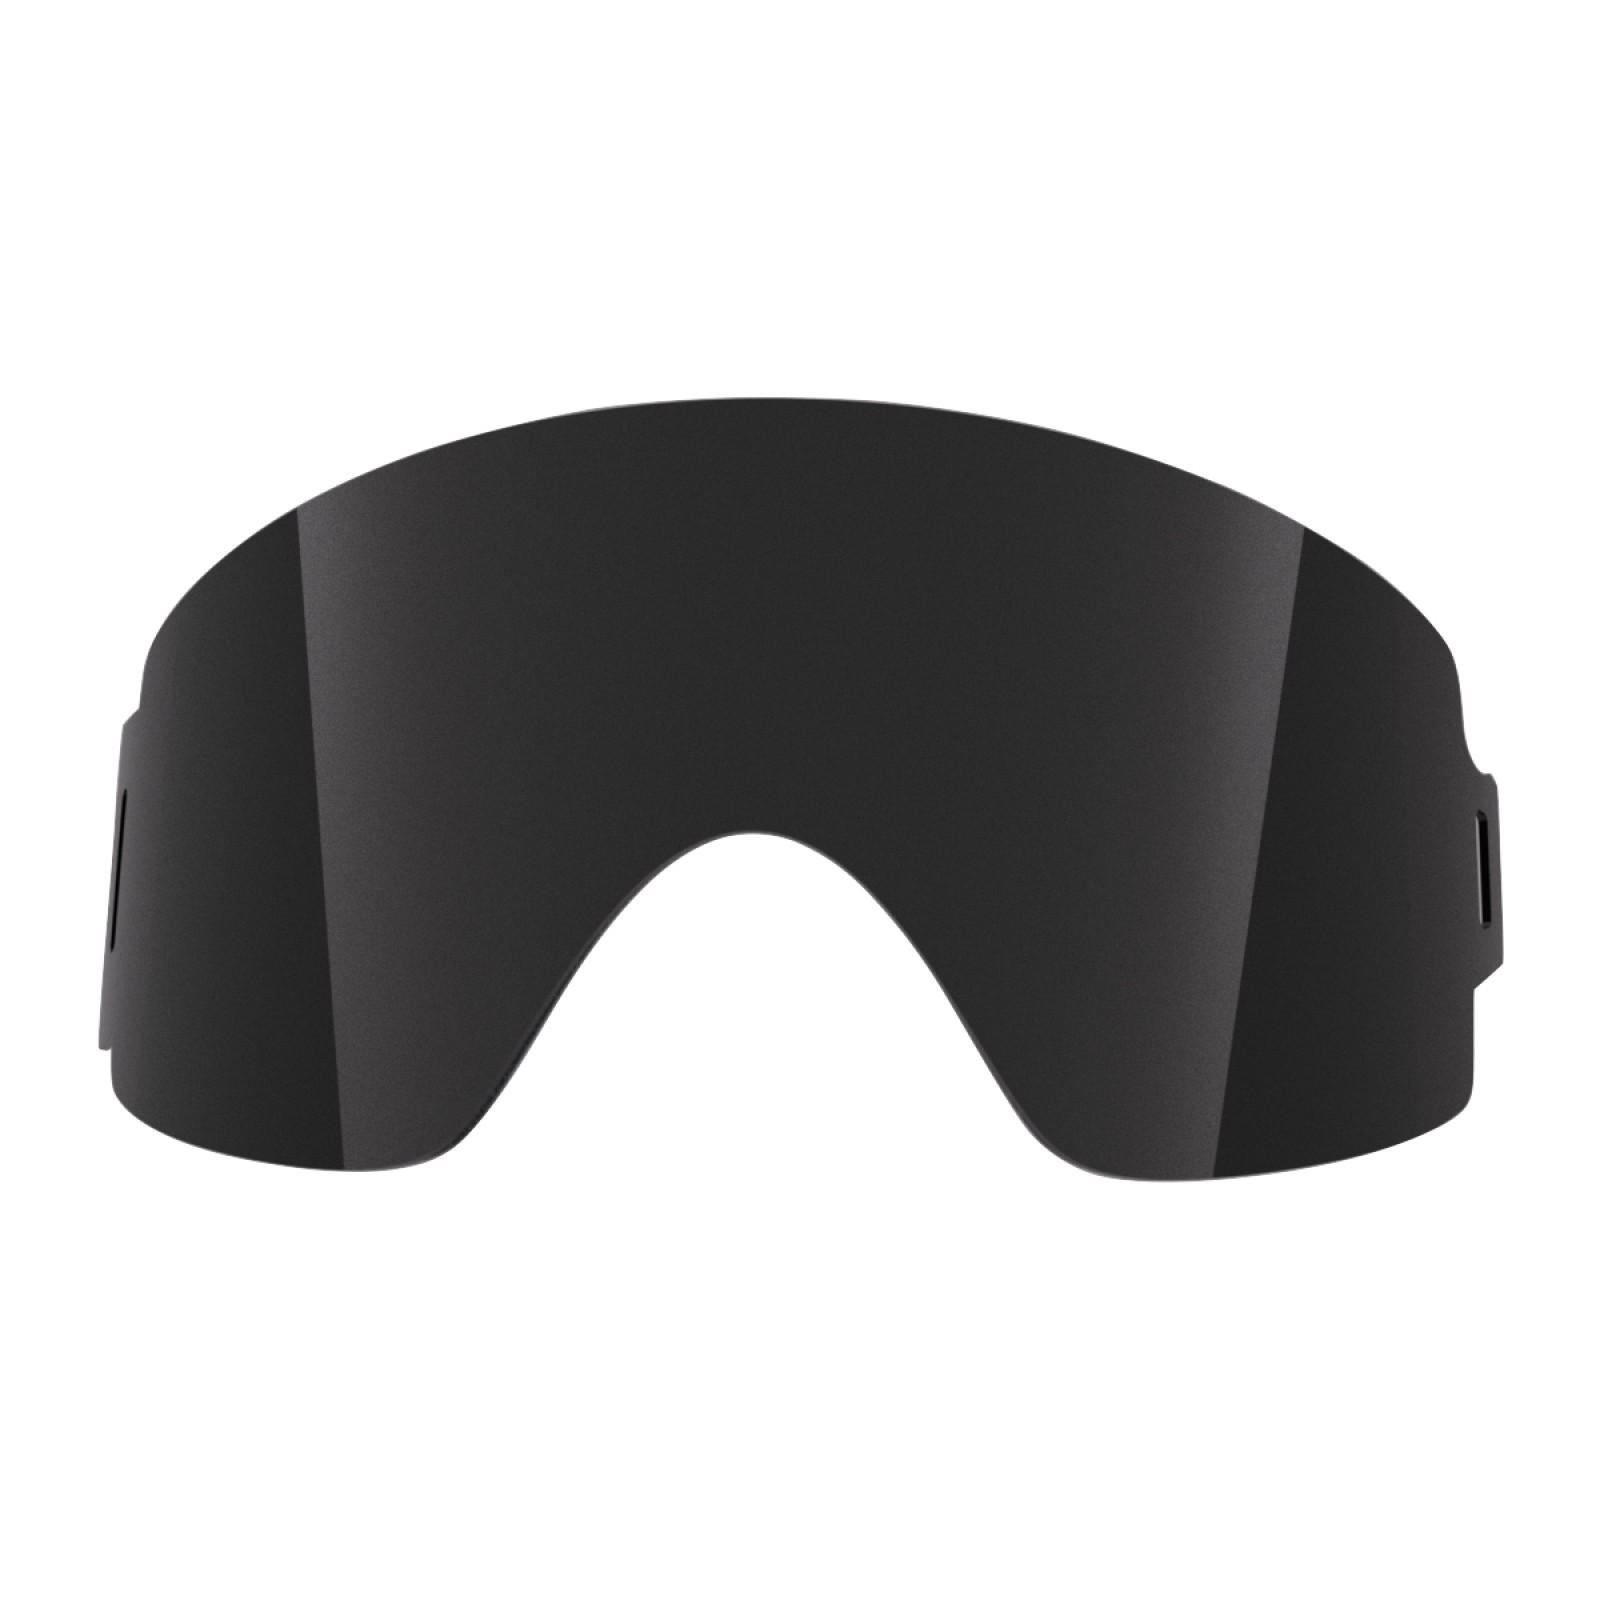 DARK SMOKE lens for  Shift goggle